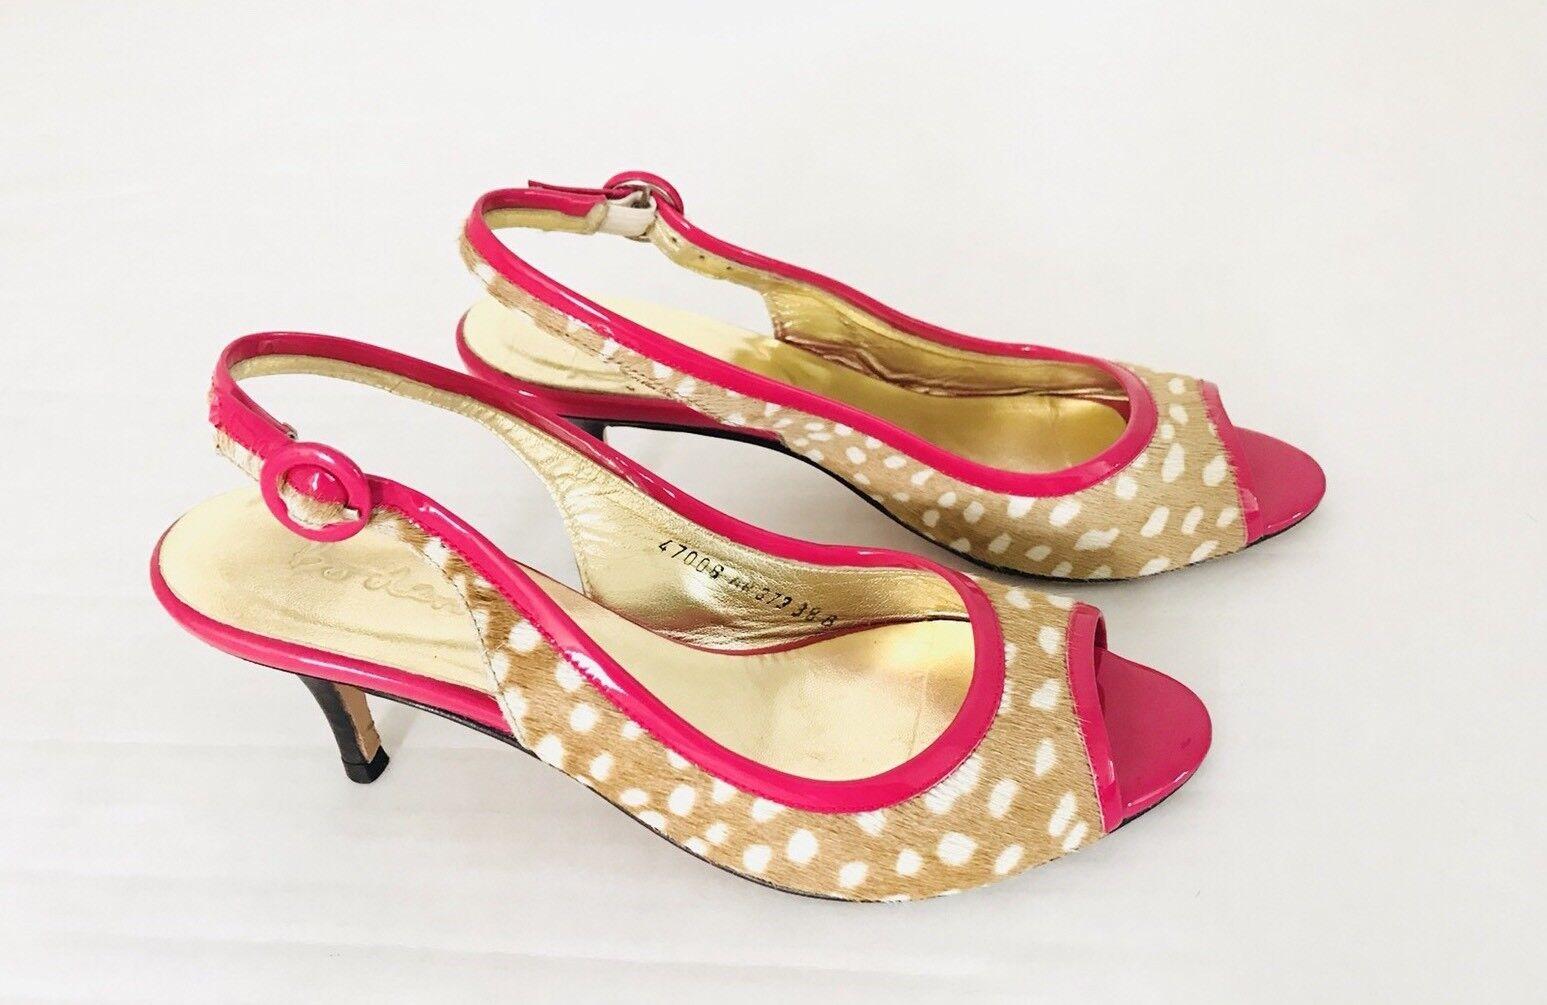 Boden Polka Dots Slingback Size 38 US 7 Pink Animal Print Peep-toe Kitten Heel